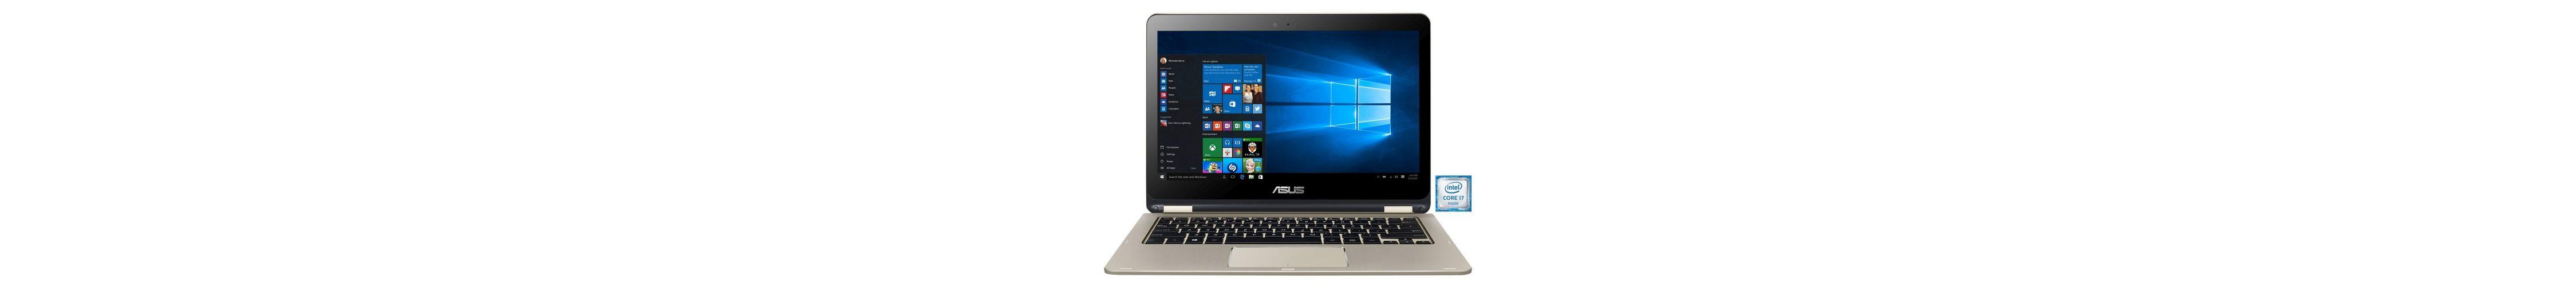 "ASUS TP301UA-DW234T Notebook »Intel Core i7, 33,7cm (13,3""), 512 GB SSD, 8 GB«"